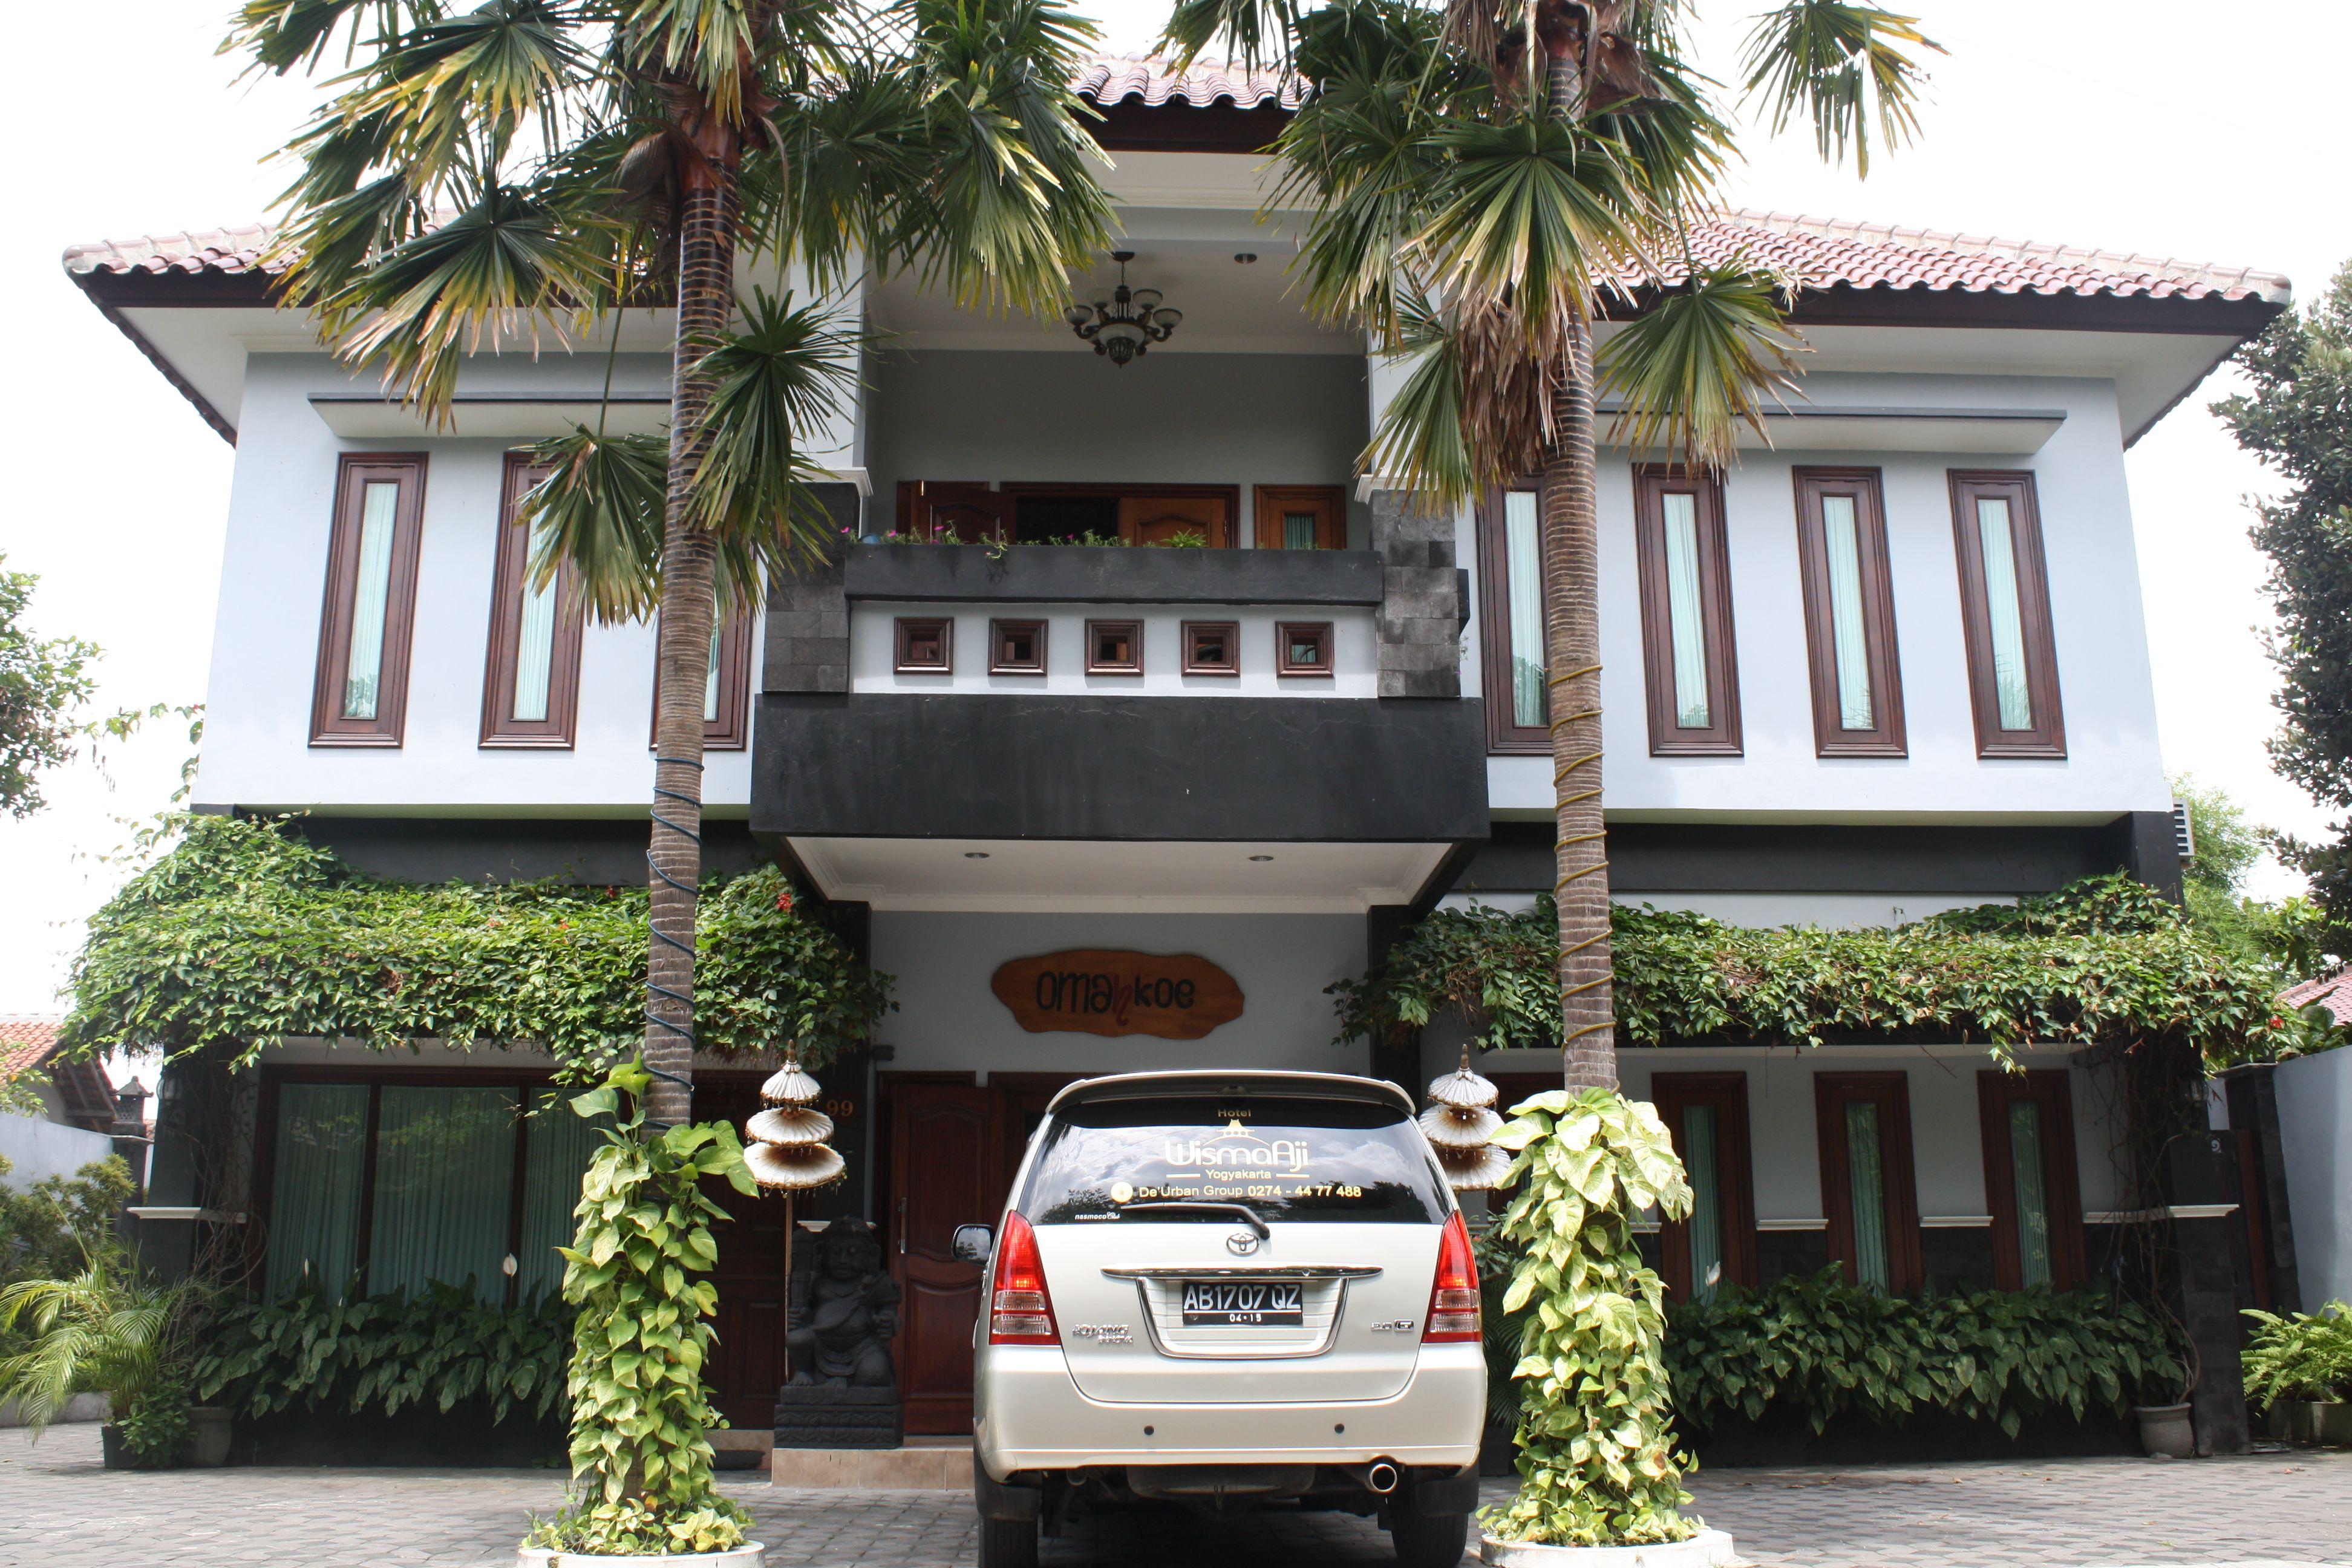 Omahkoe Guesthouse Yogyakarta, Sleman